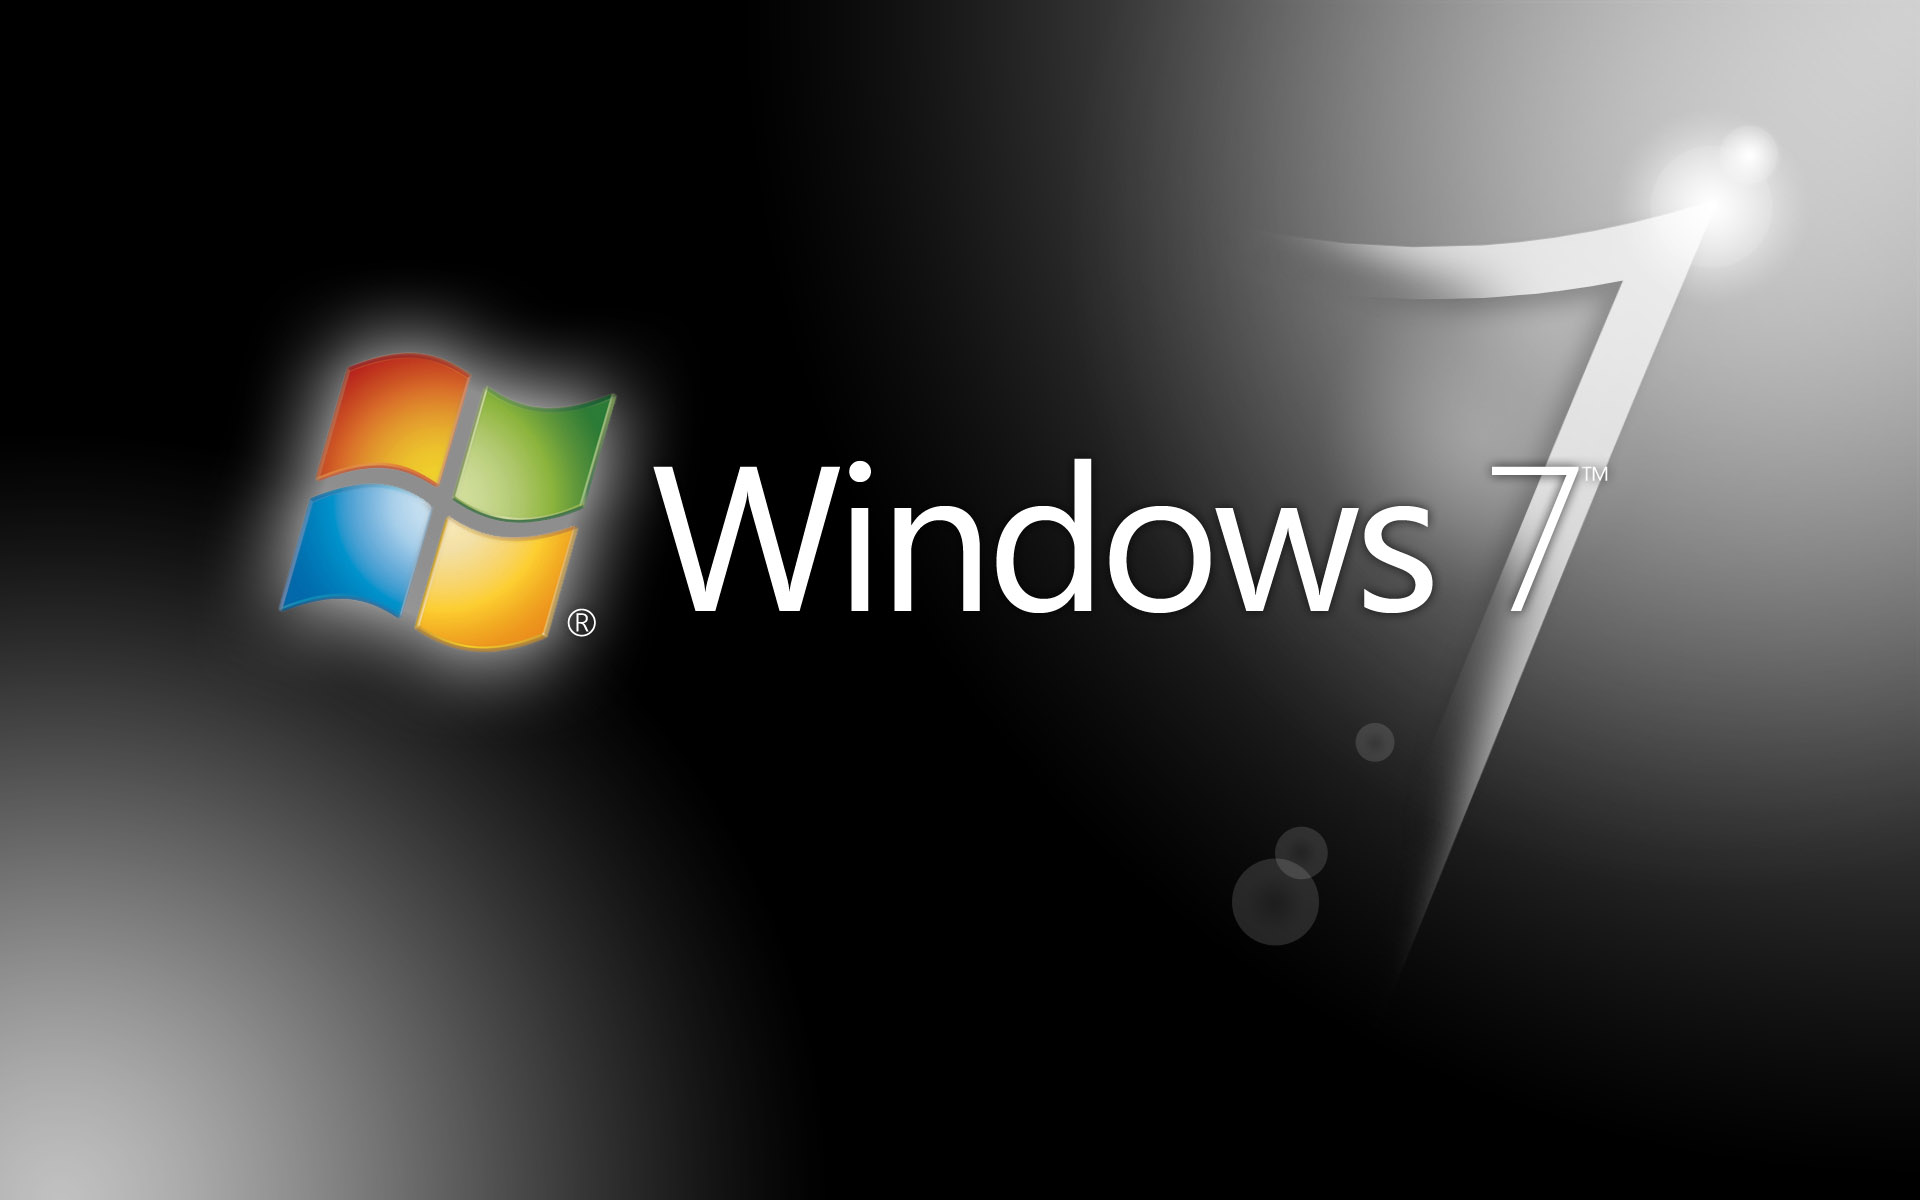 1200windows7梦幻桌面下载壁纸,windows7梦幻桌面下载壁纸图片图片